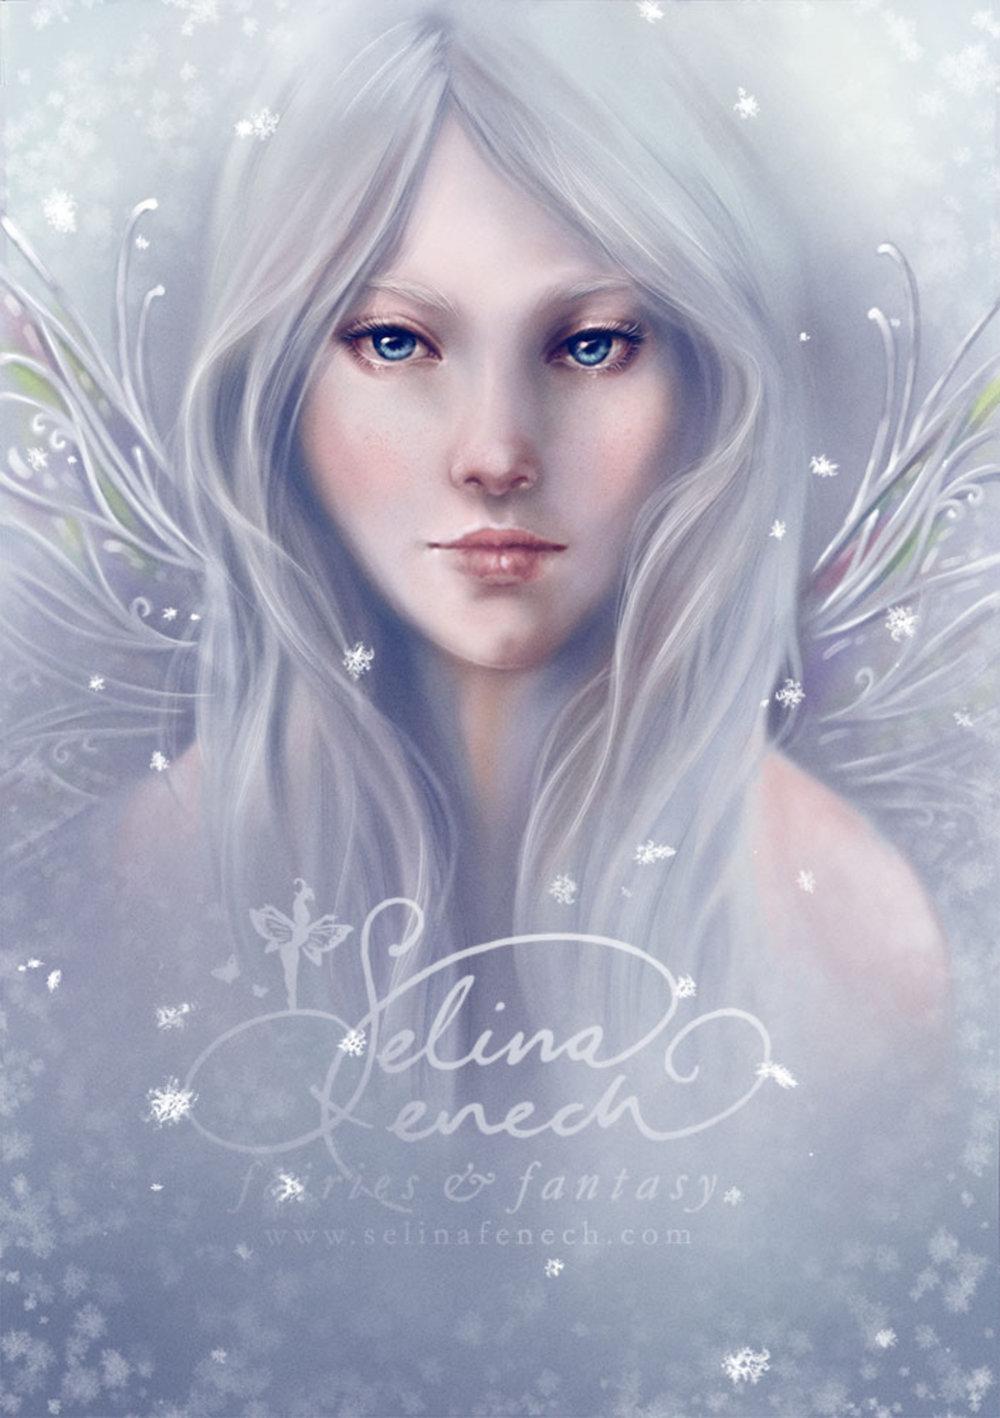 Snowsprite